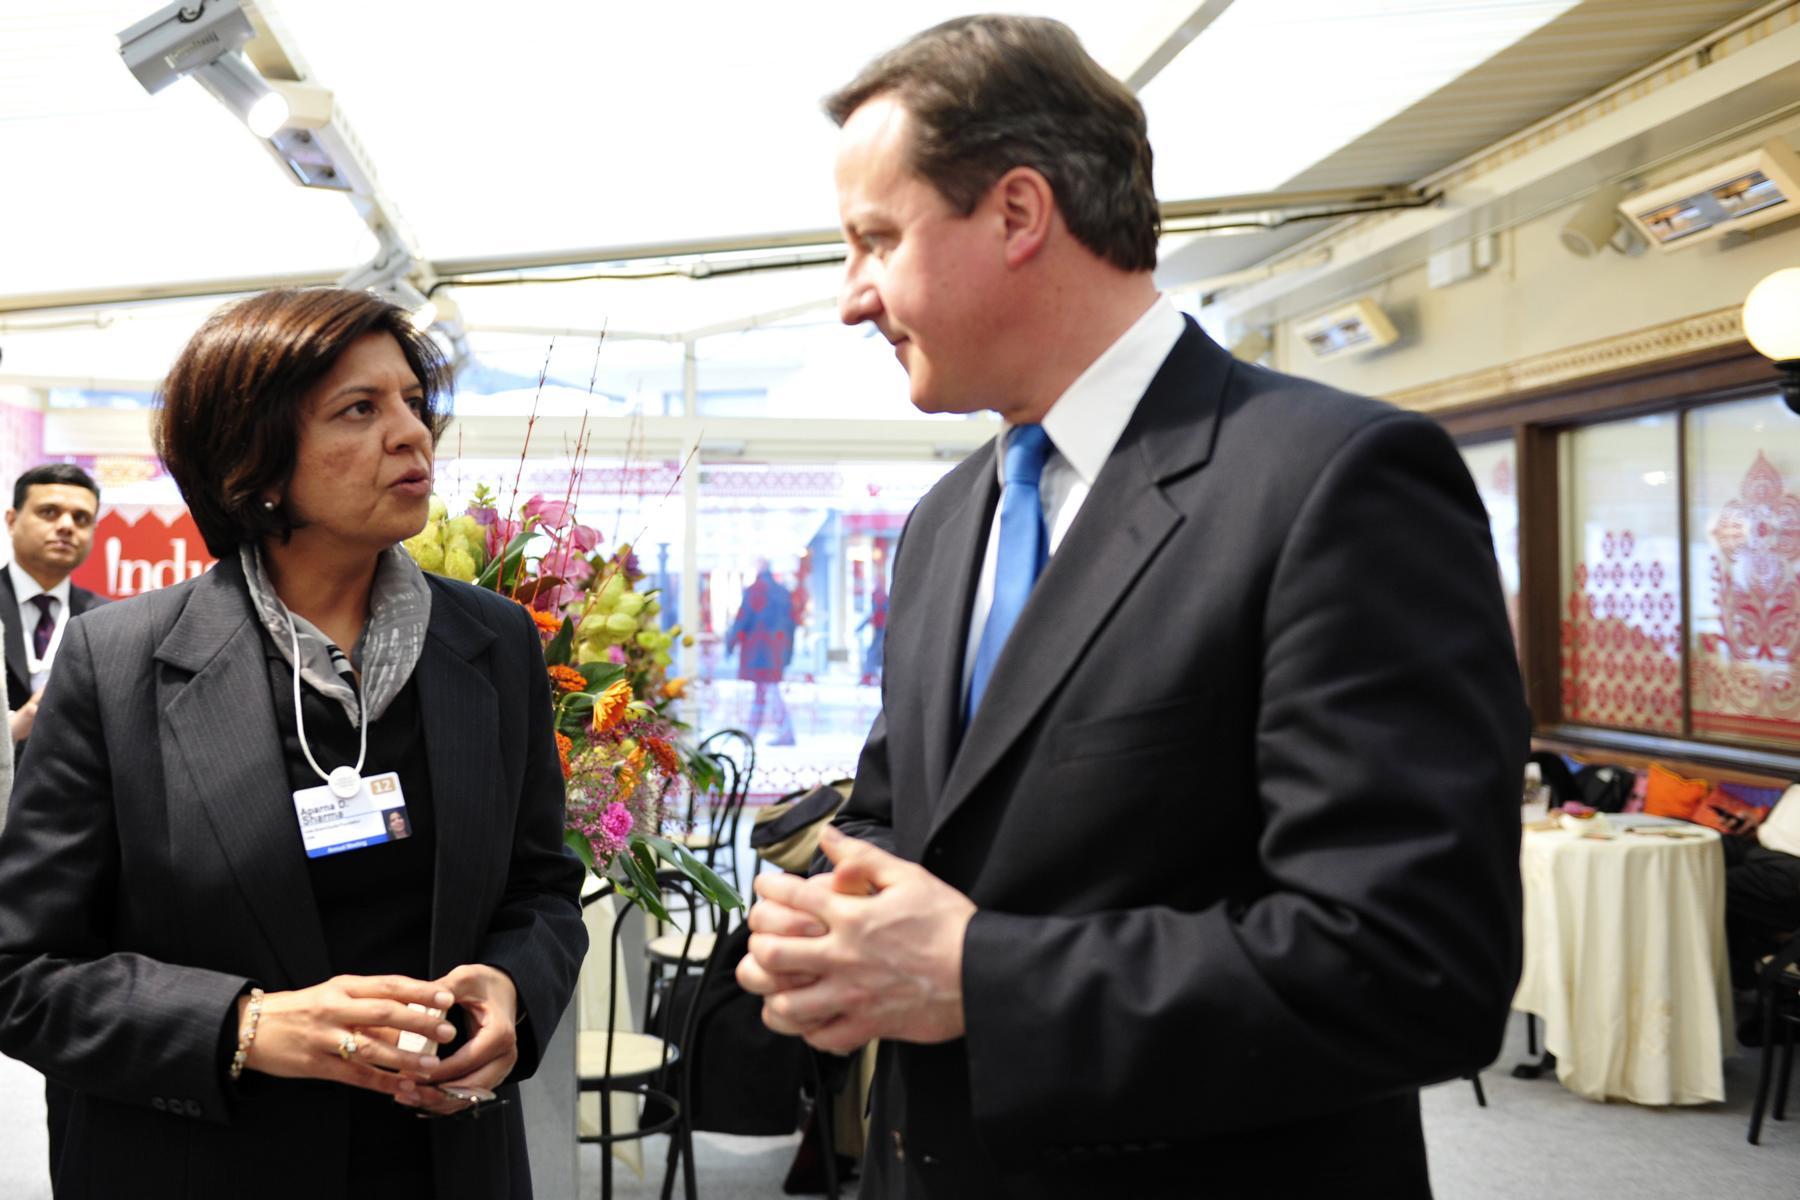 Aparna Sharma with UK Prime Minister David Cameron